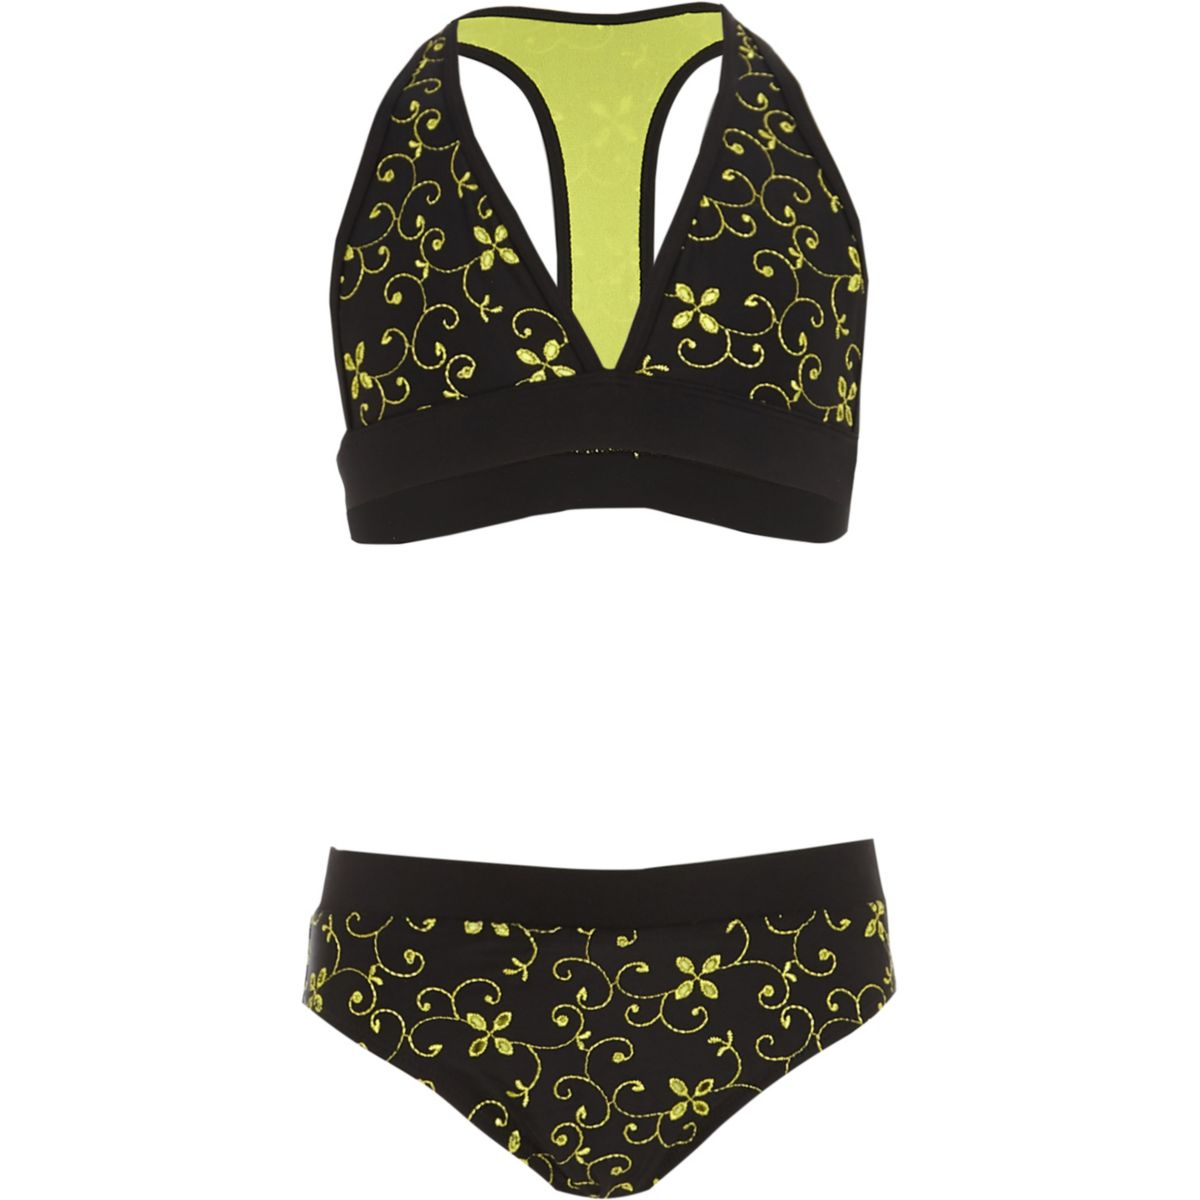 Girls black broderie triangle bikini set